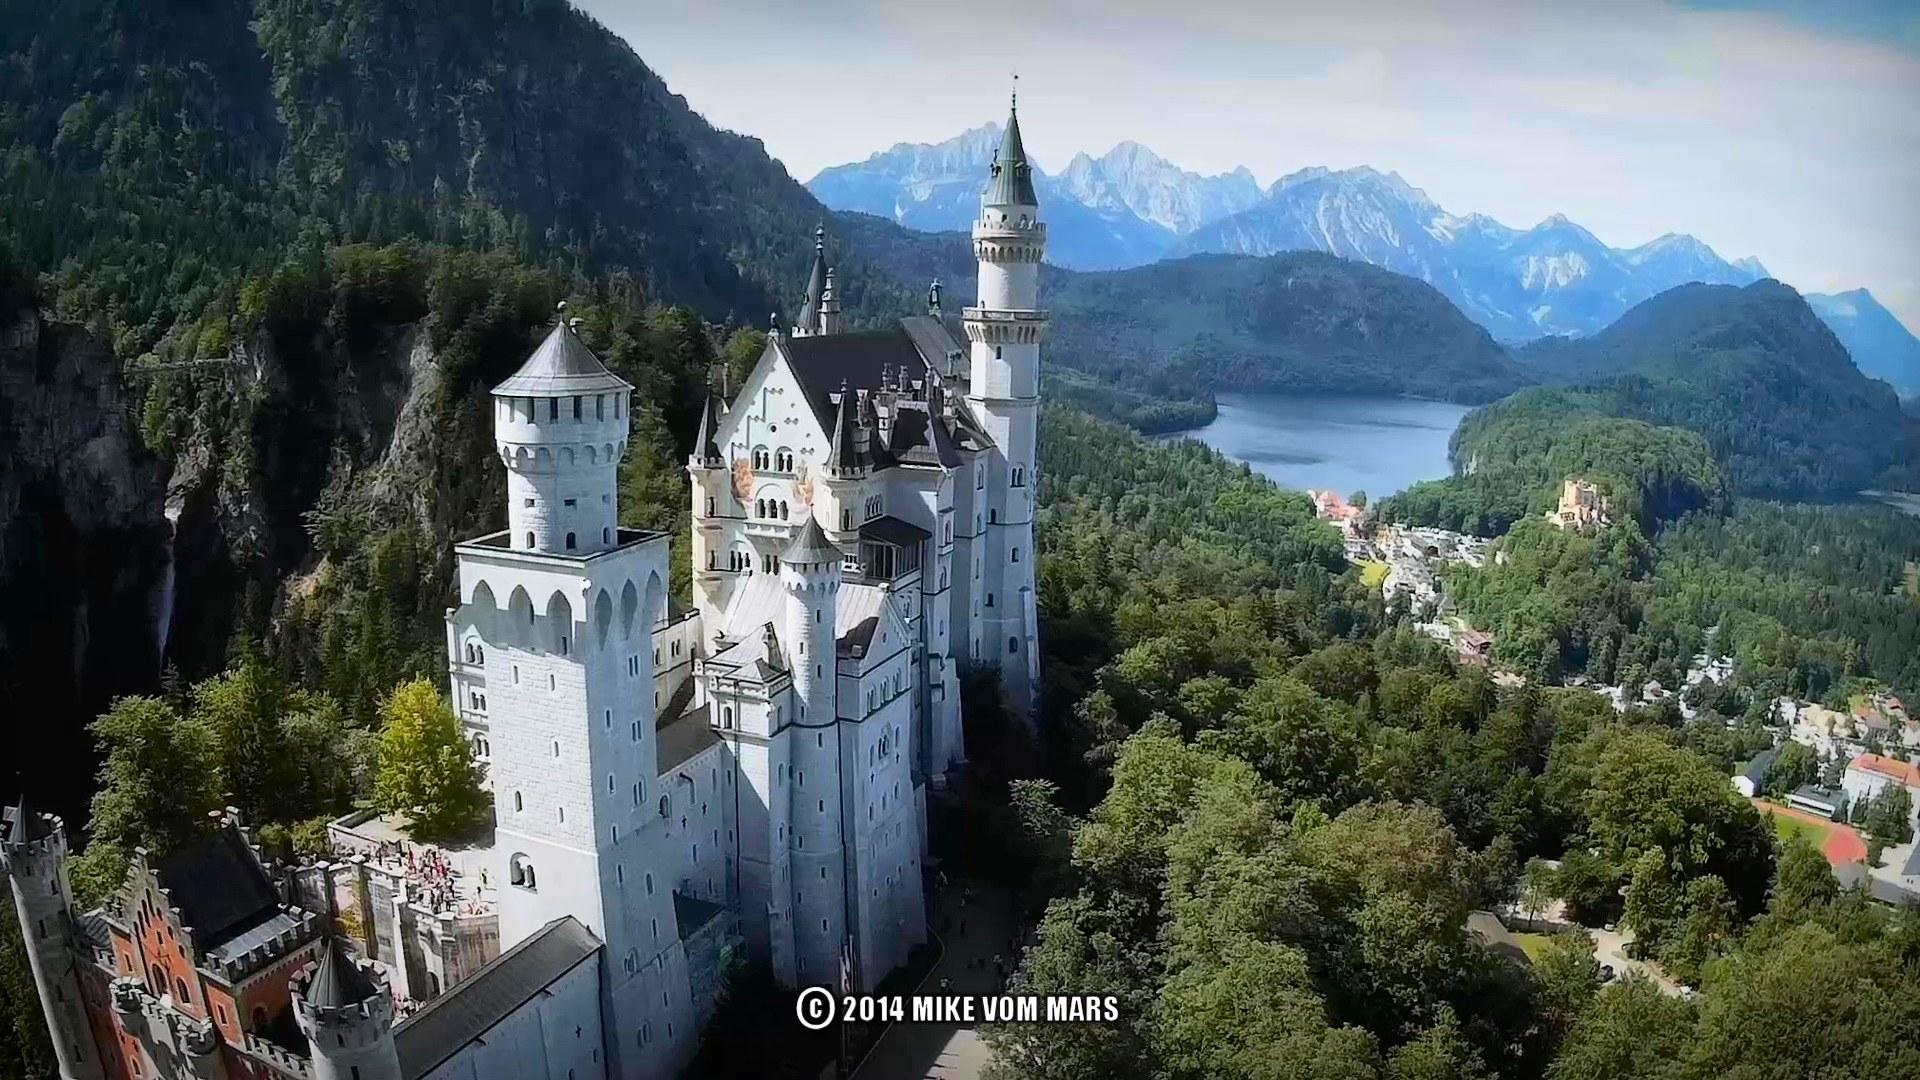 Spektakulärer FPV Flug über Schloss Neuschwanstein